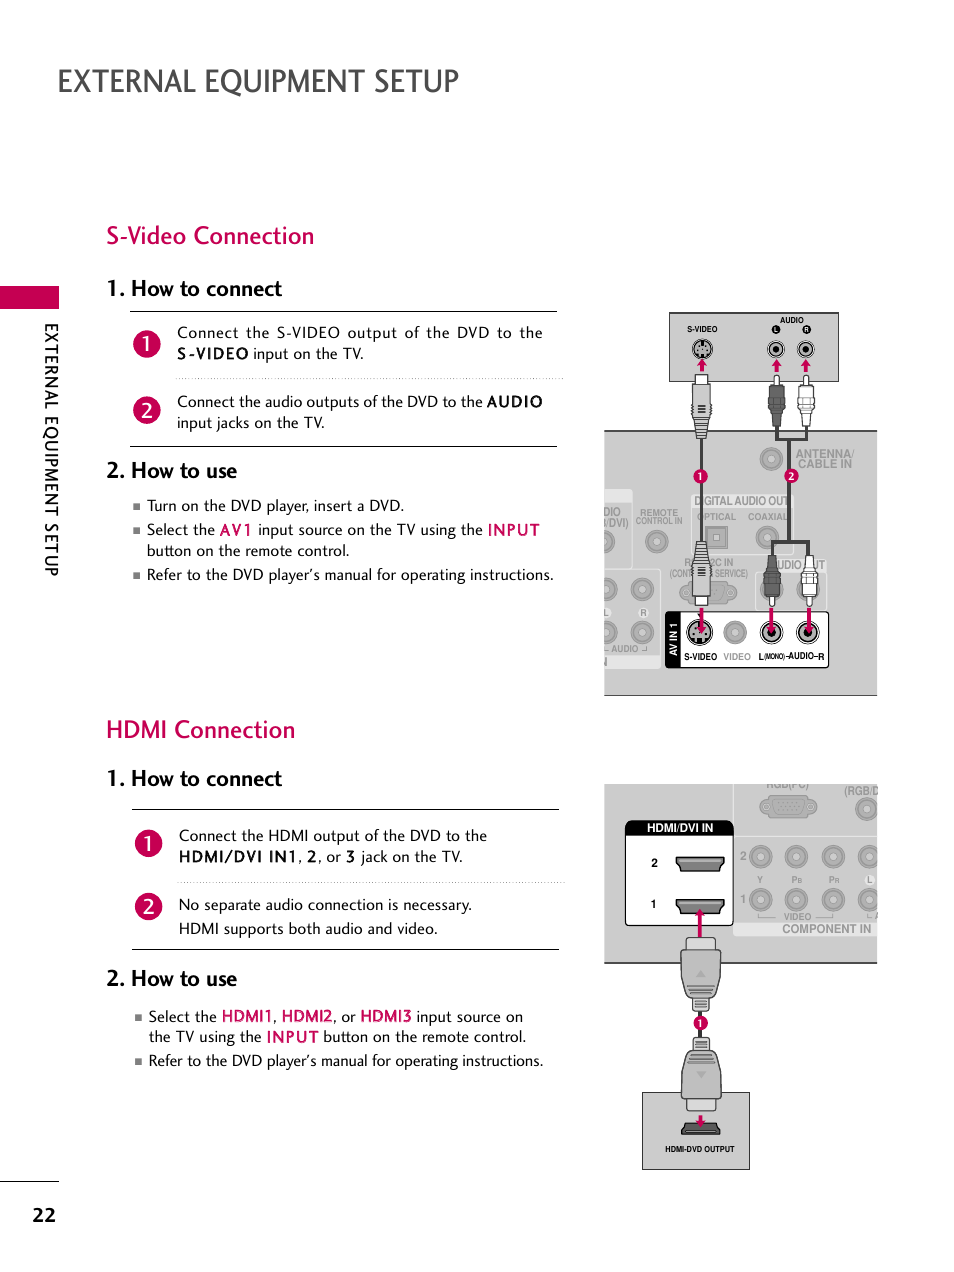 S Video Connection Hdmi Connection External Equipment Setup Lg